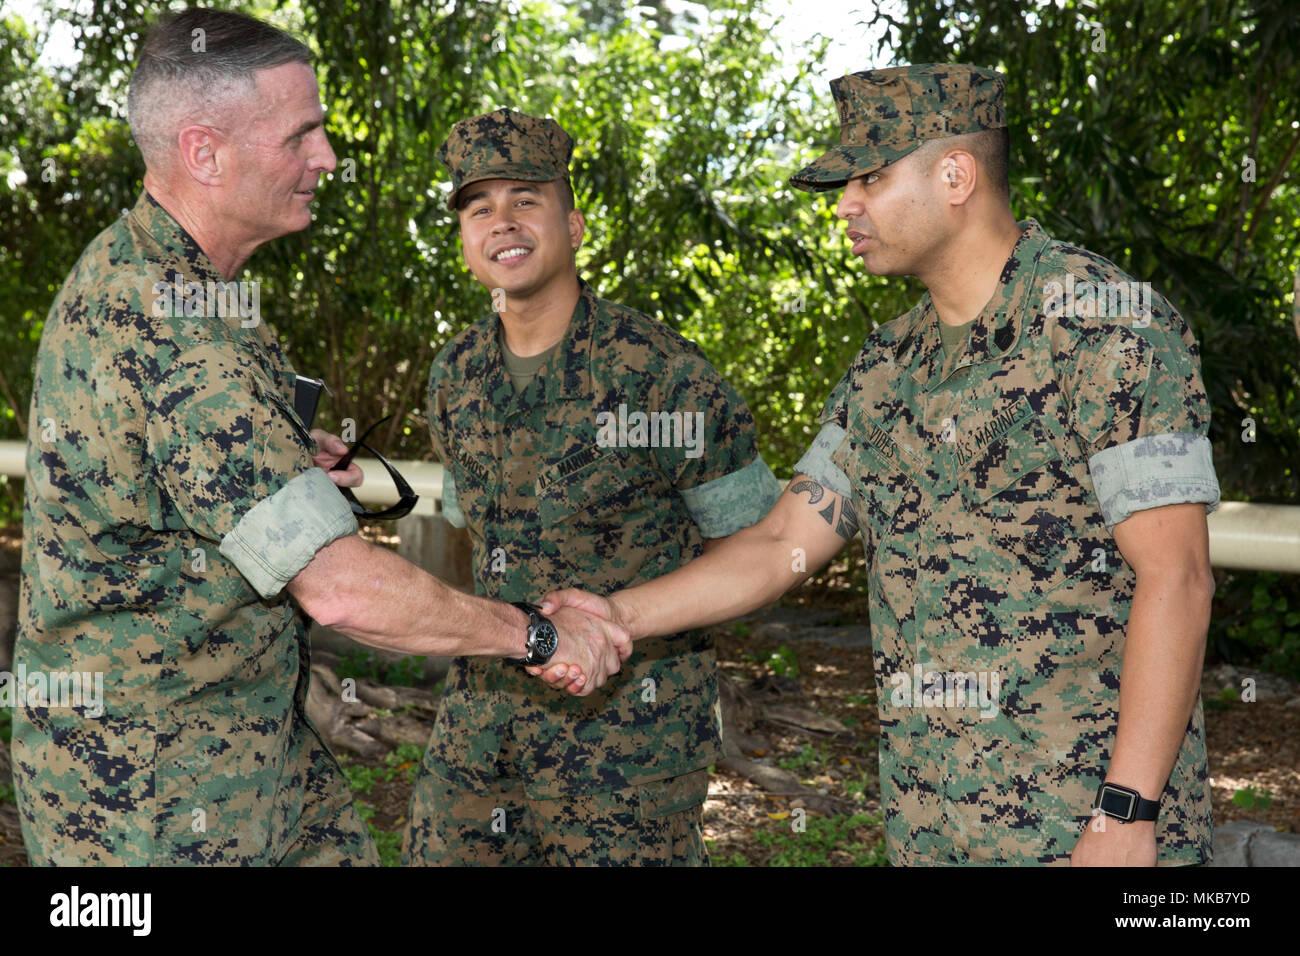 Brig Gen Christopher J Mahoney Stock Photos & Brig Gen